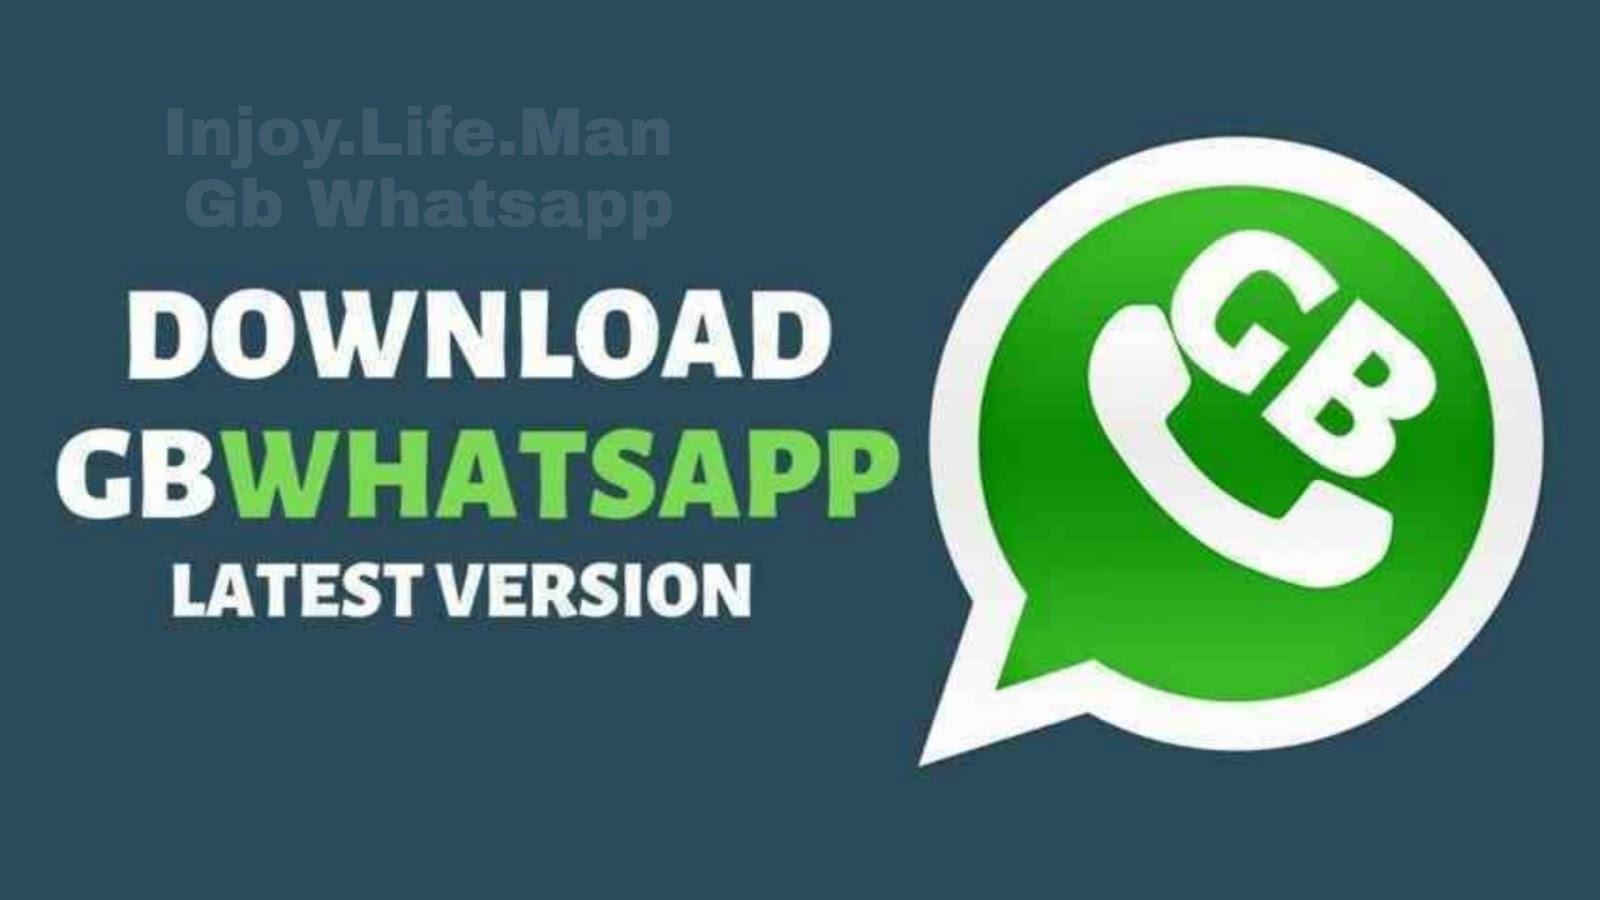 Gbwhatsapp Apk Download Gb Whatsapp 2019 Latest Versiongb Whatsapp Download